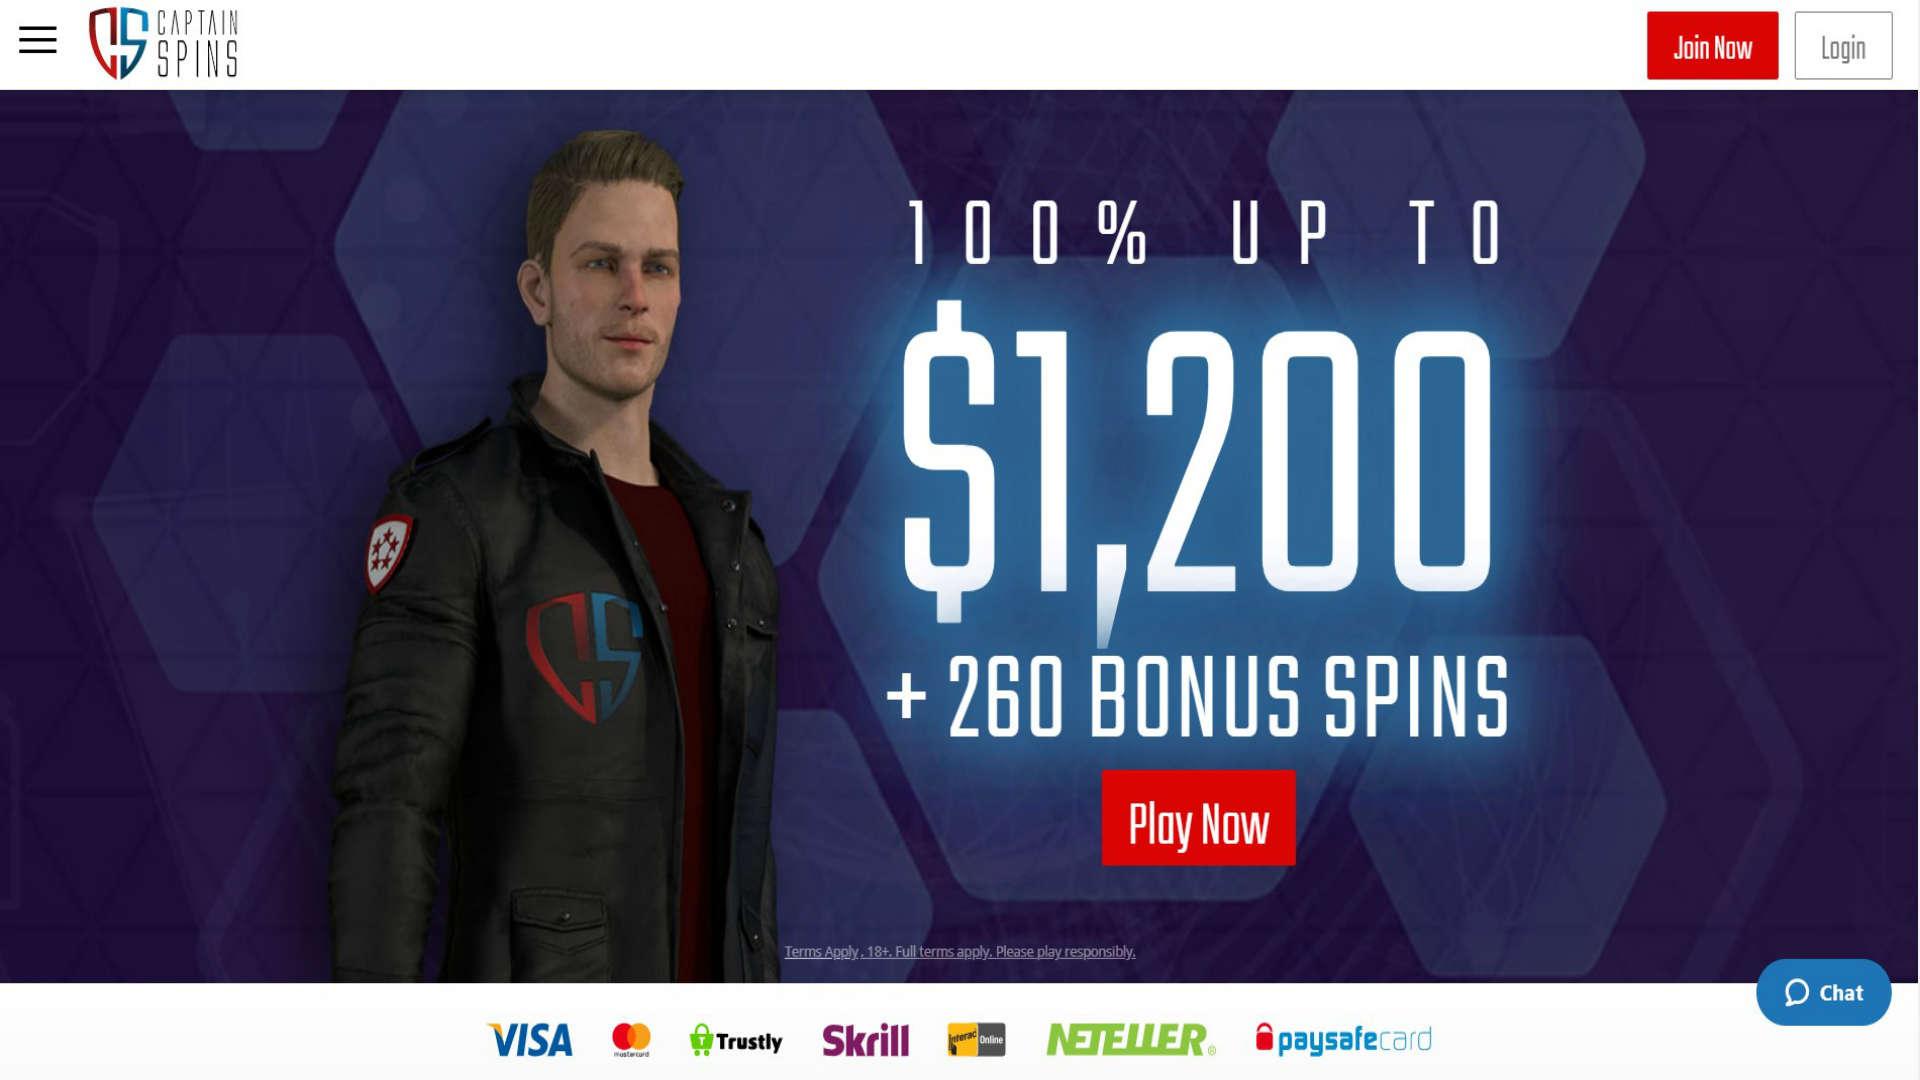 Captain Spins Casino screenshot